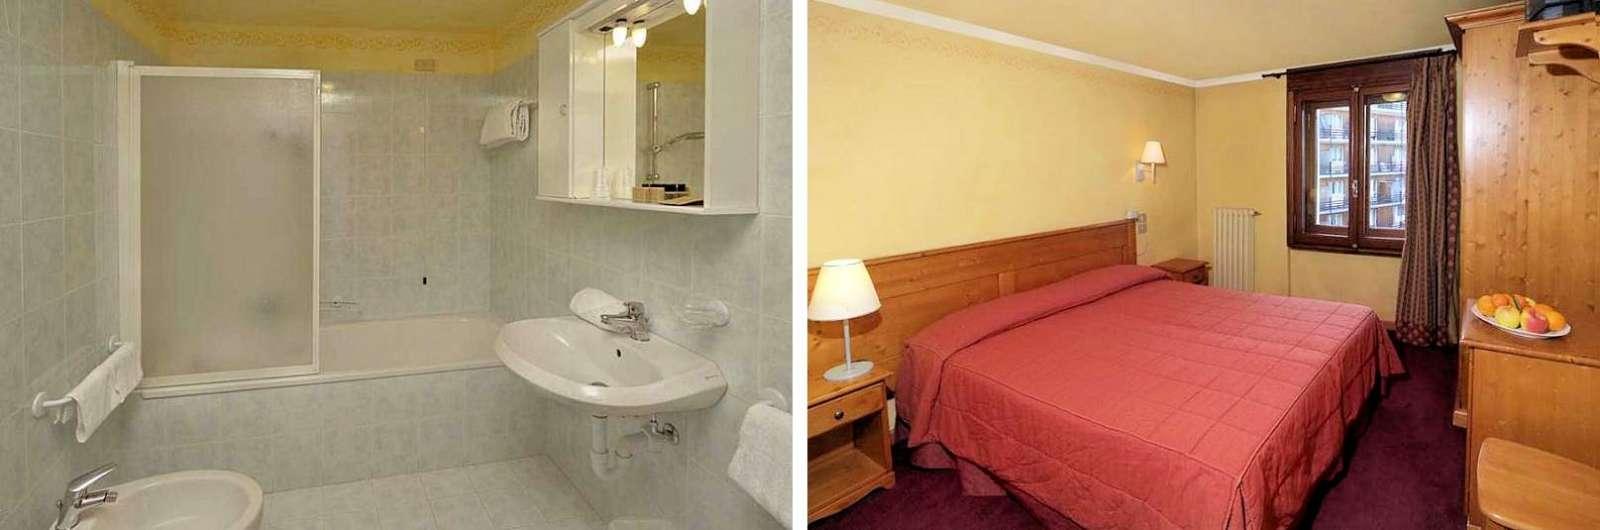 Exemple de salle de bain